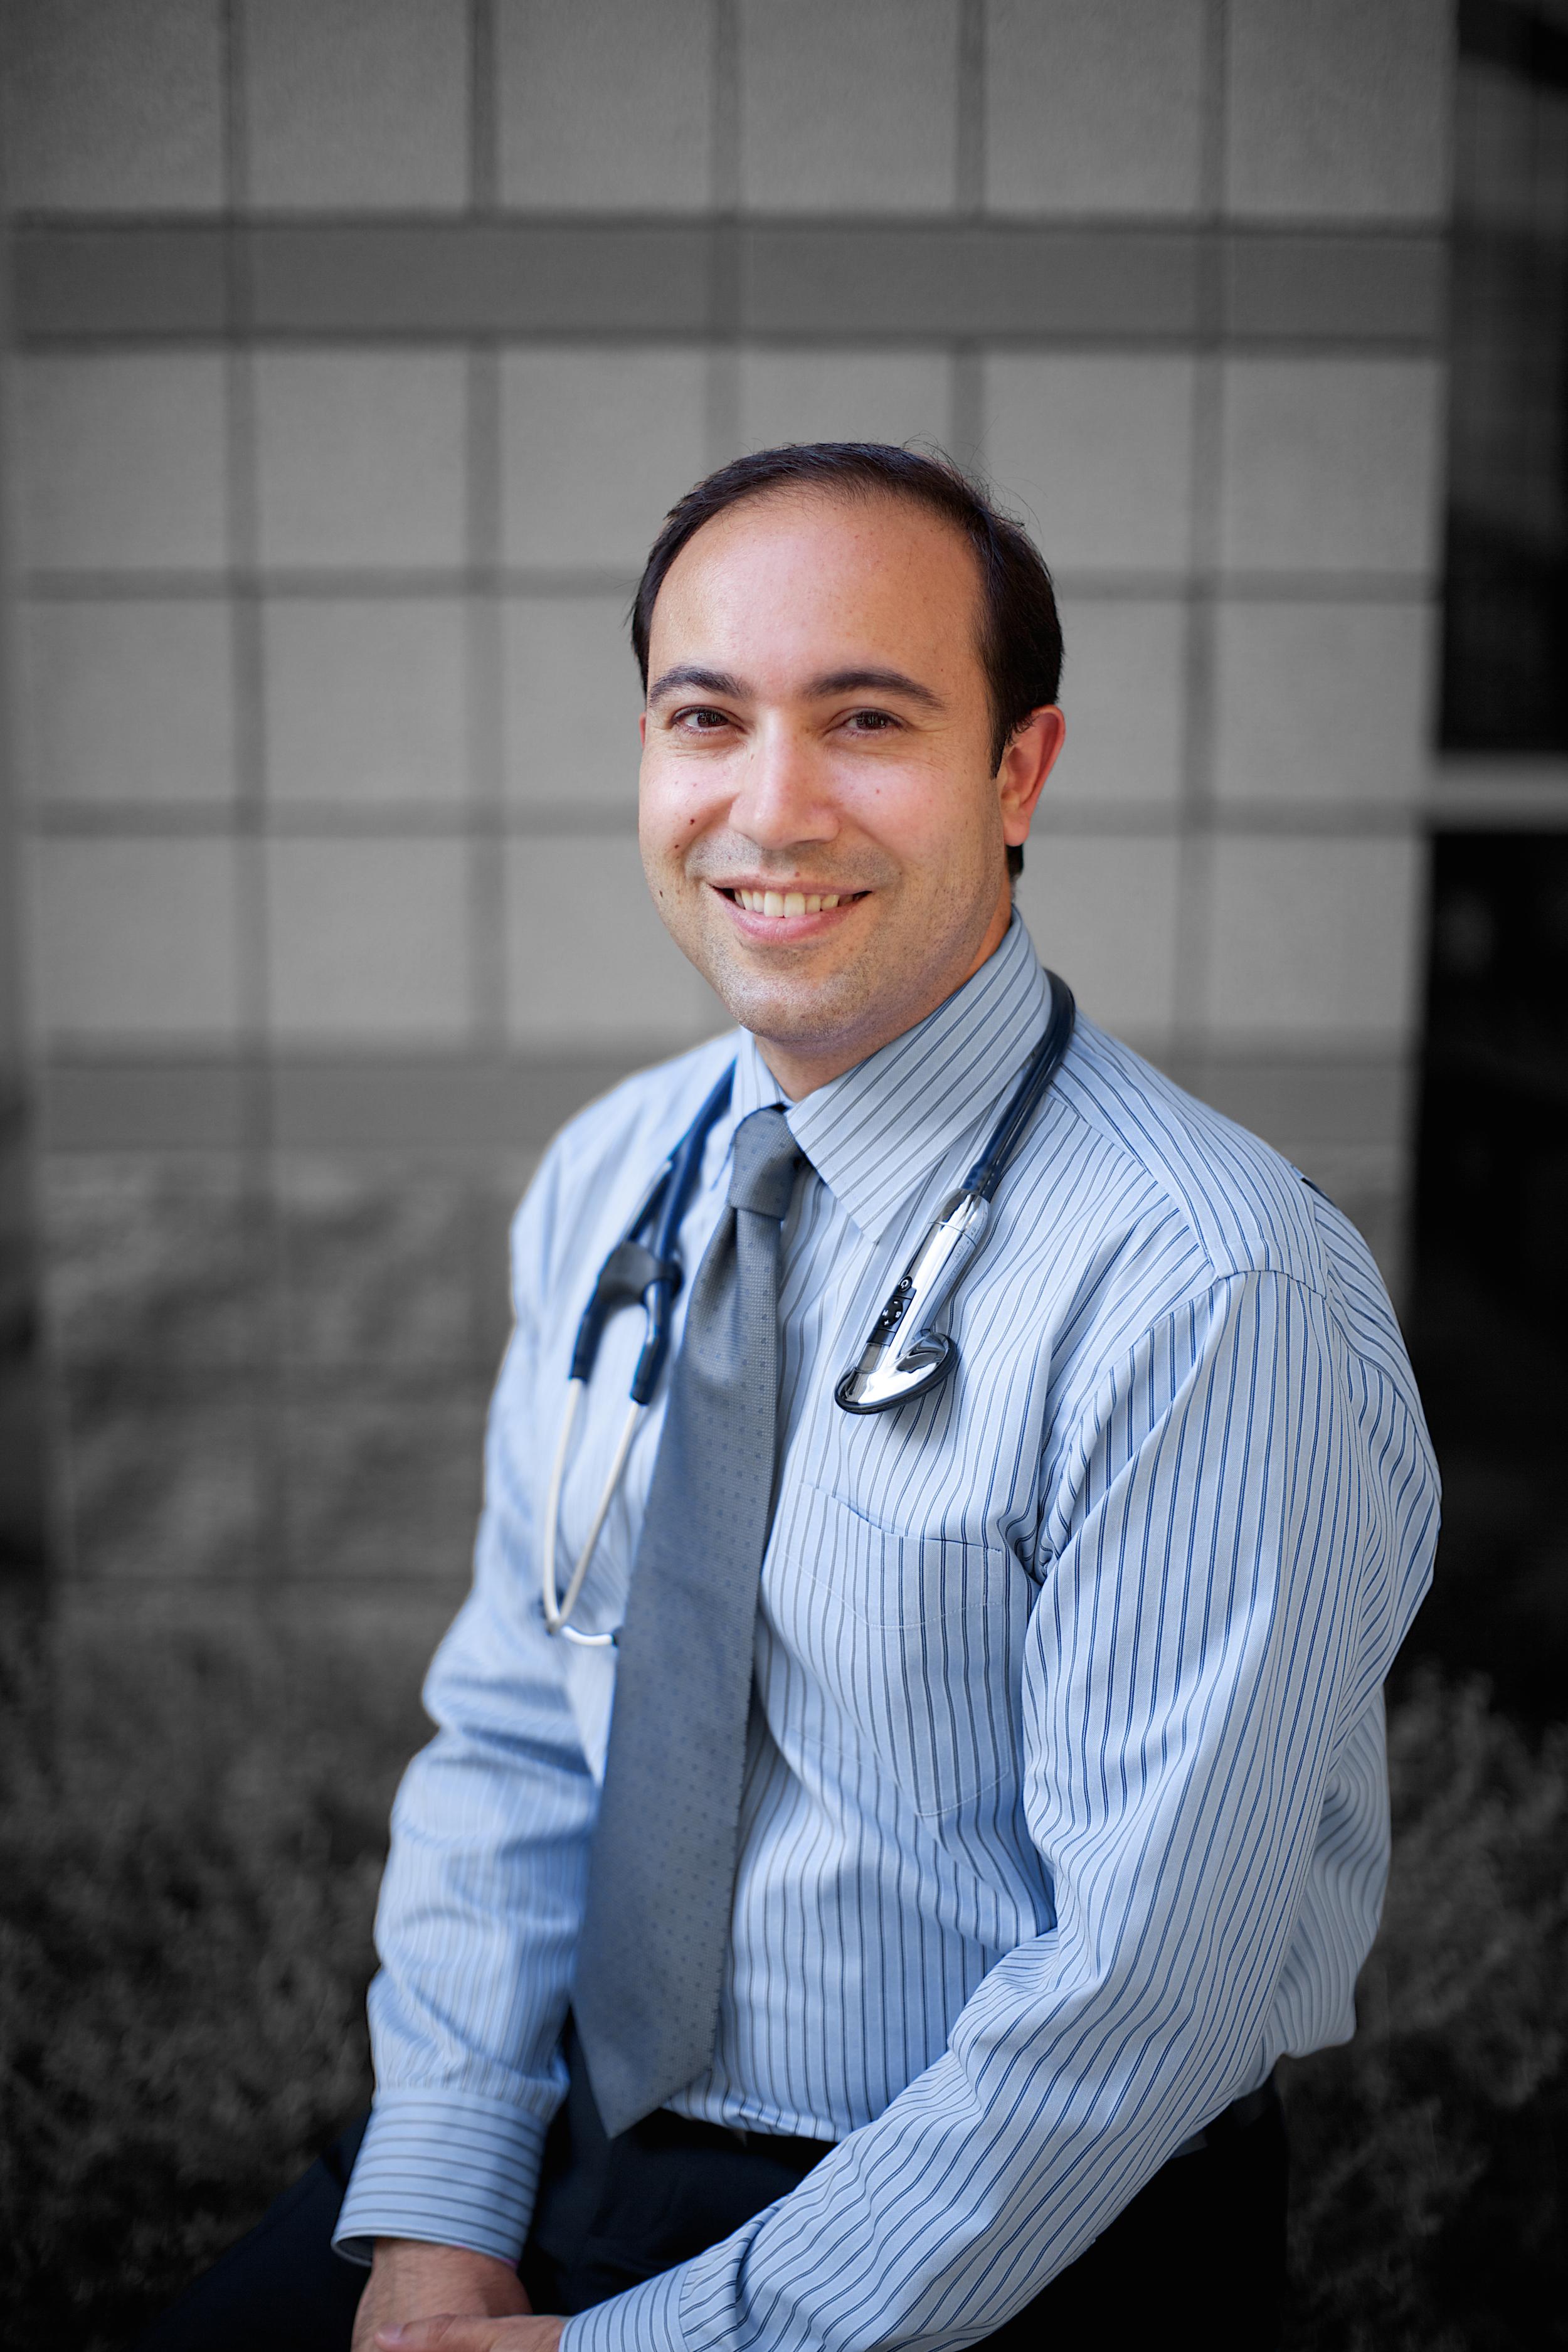 Dr Sam Fereidouni, MD